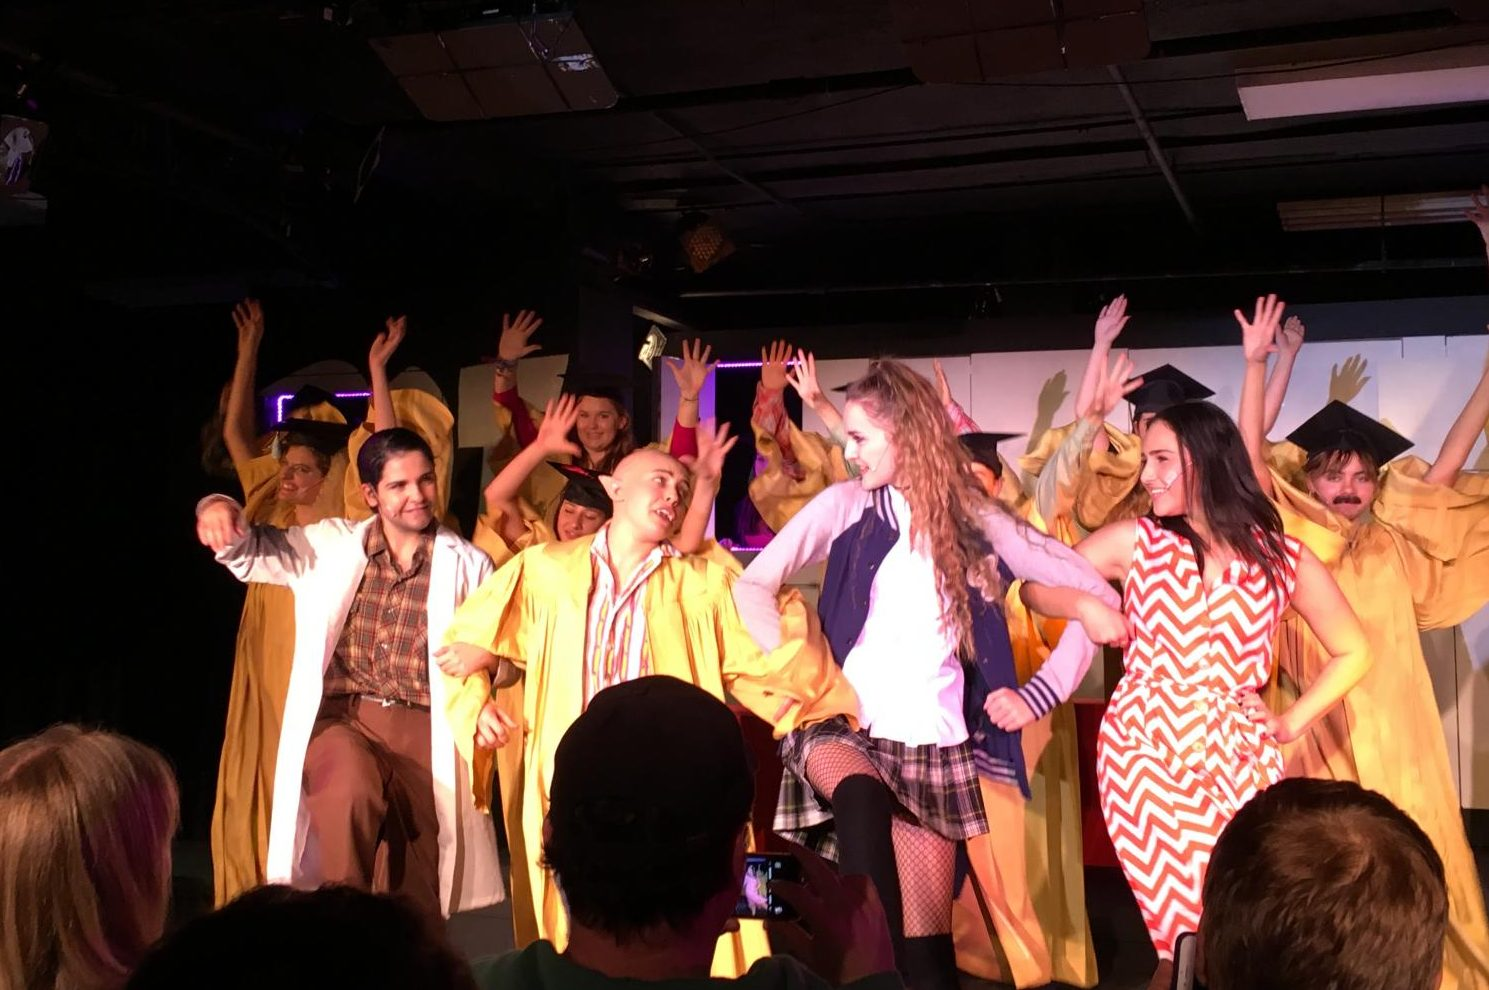 Sophie+Evans-Katz+%2718%2C+Shira+Goldstein+%2719%2C+Dani+Beauregard+%2718+and+Julianna+Goldsmith+%2718+sing+in+front+of+the+entire+cast.+This+scene+depicts+Edgar%27s+high+school+graduation.+